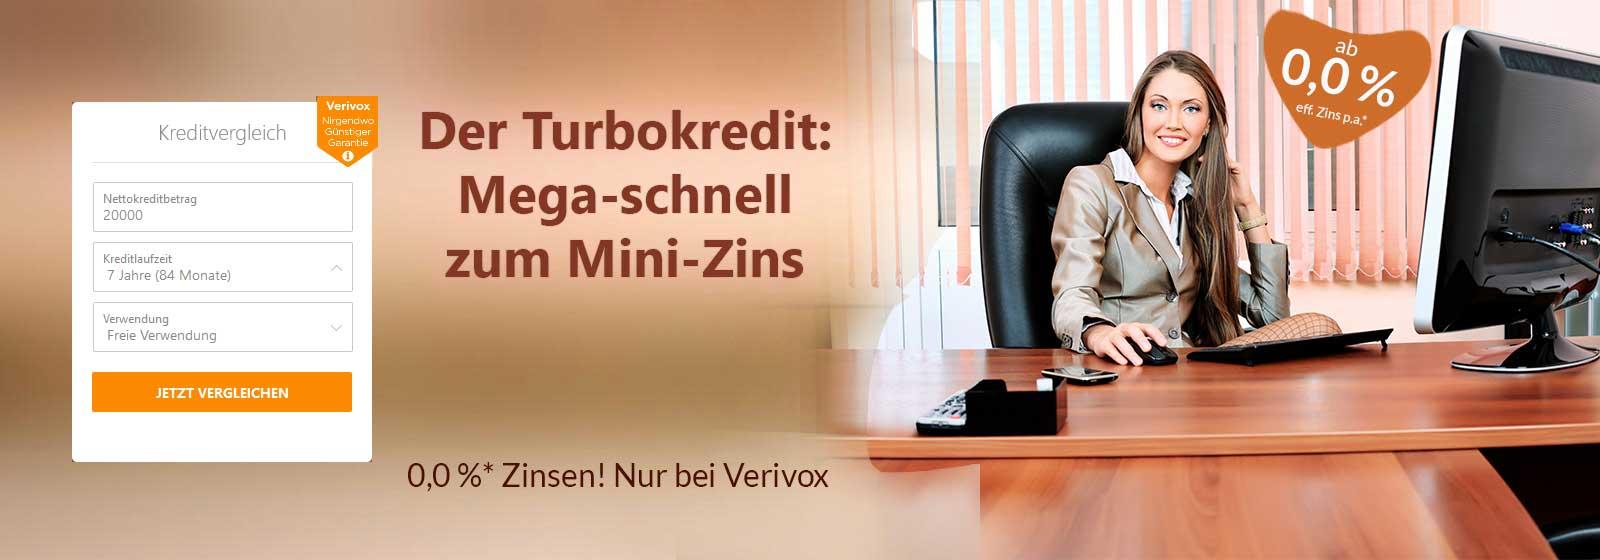 turbokredit-banner